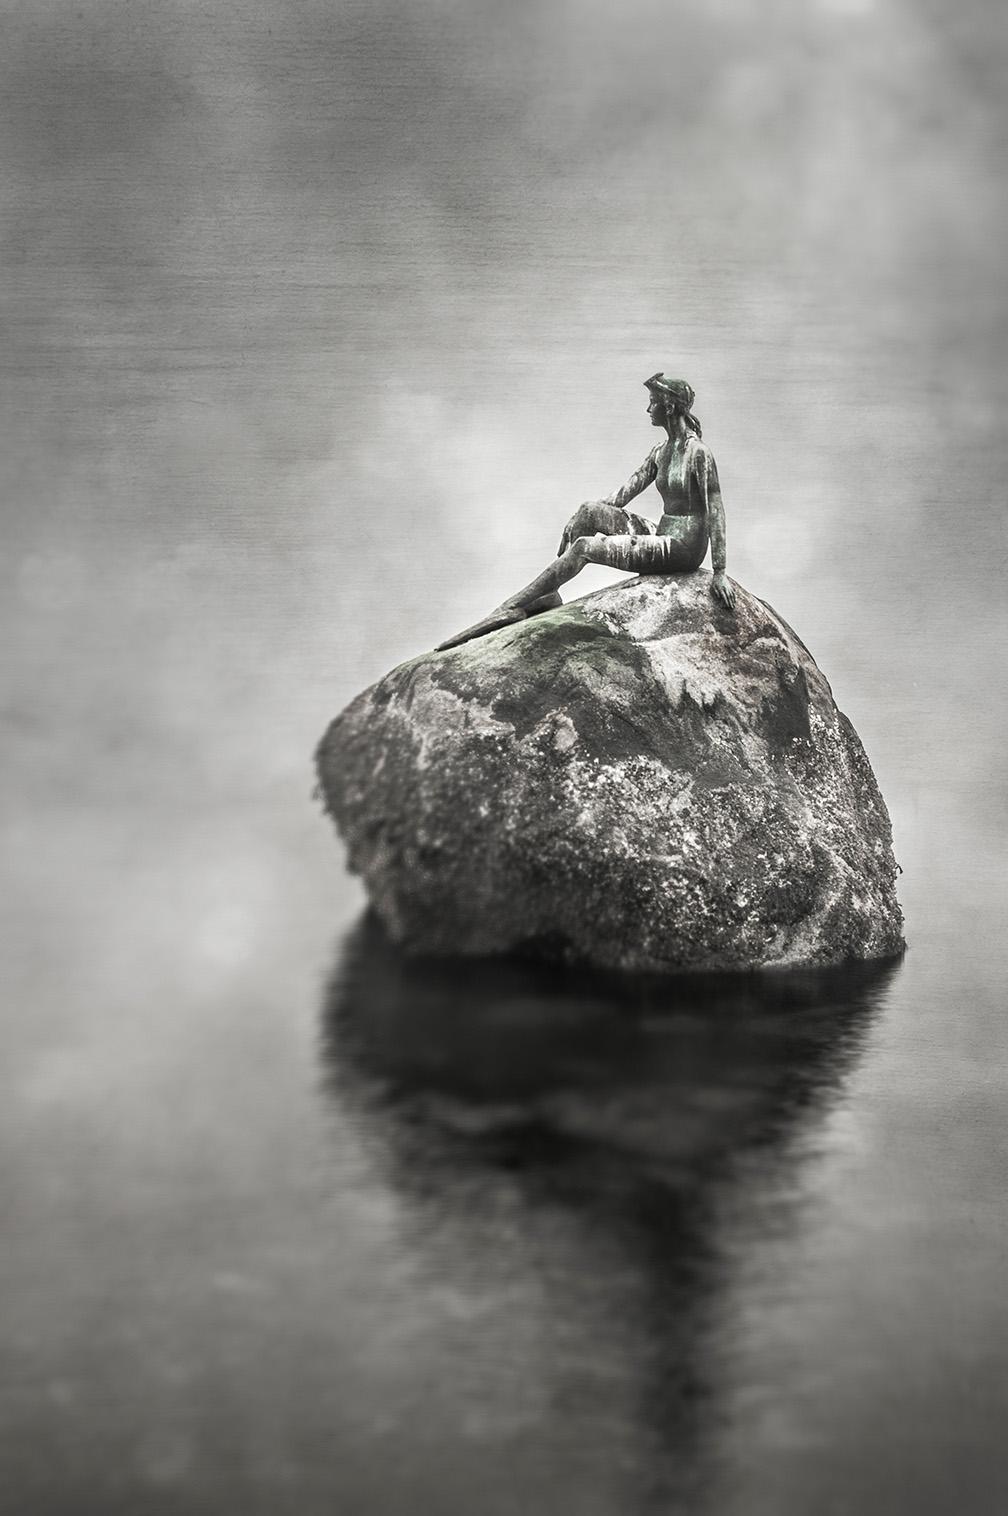 Raincity Series - Girl In A Wetsuit